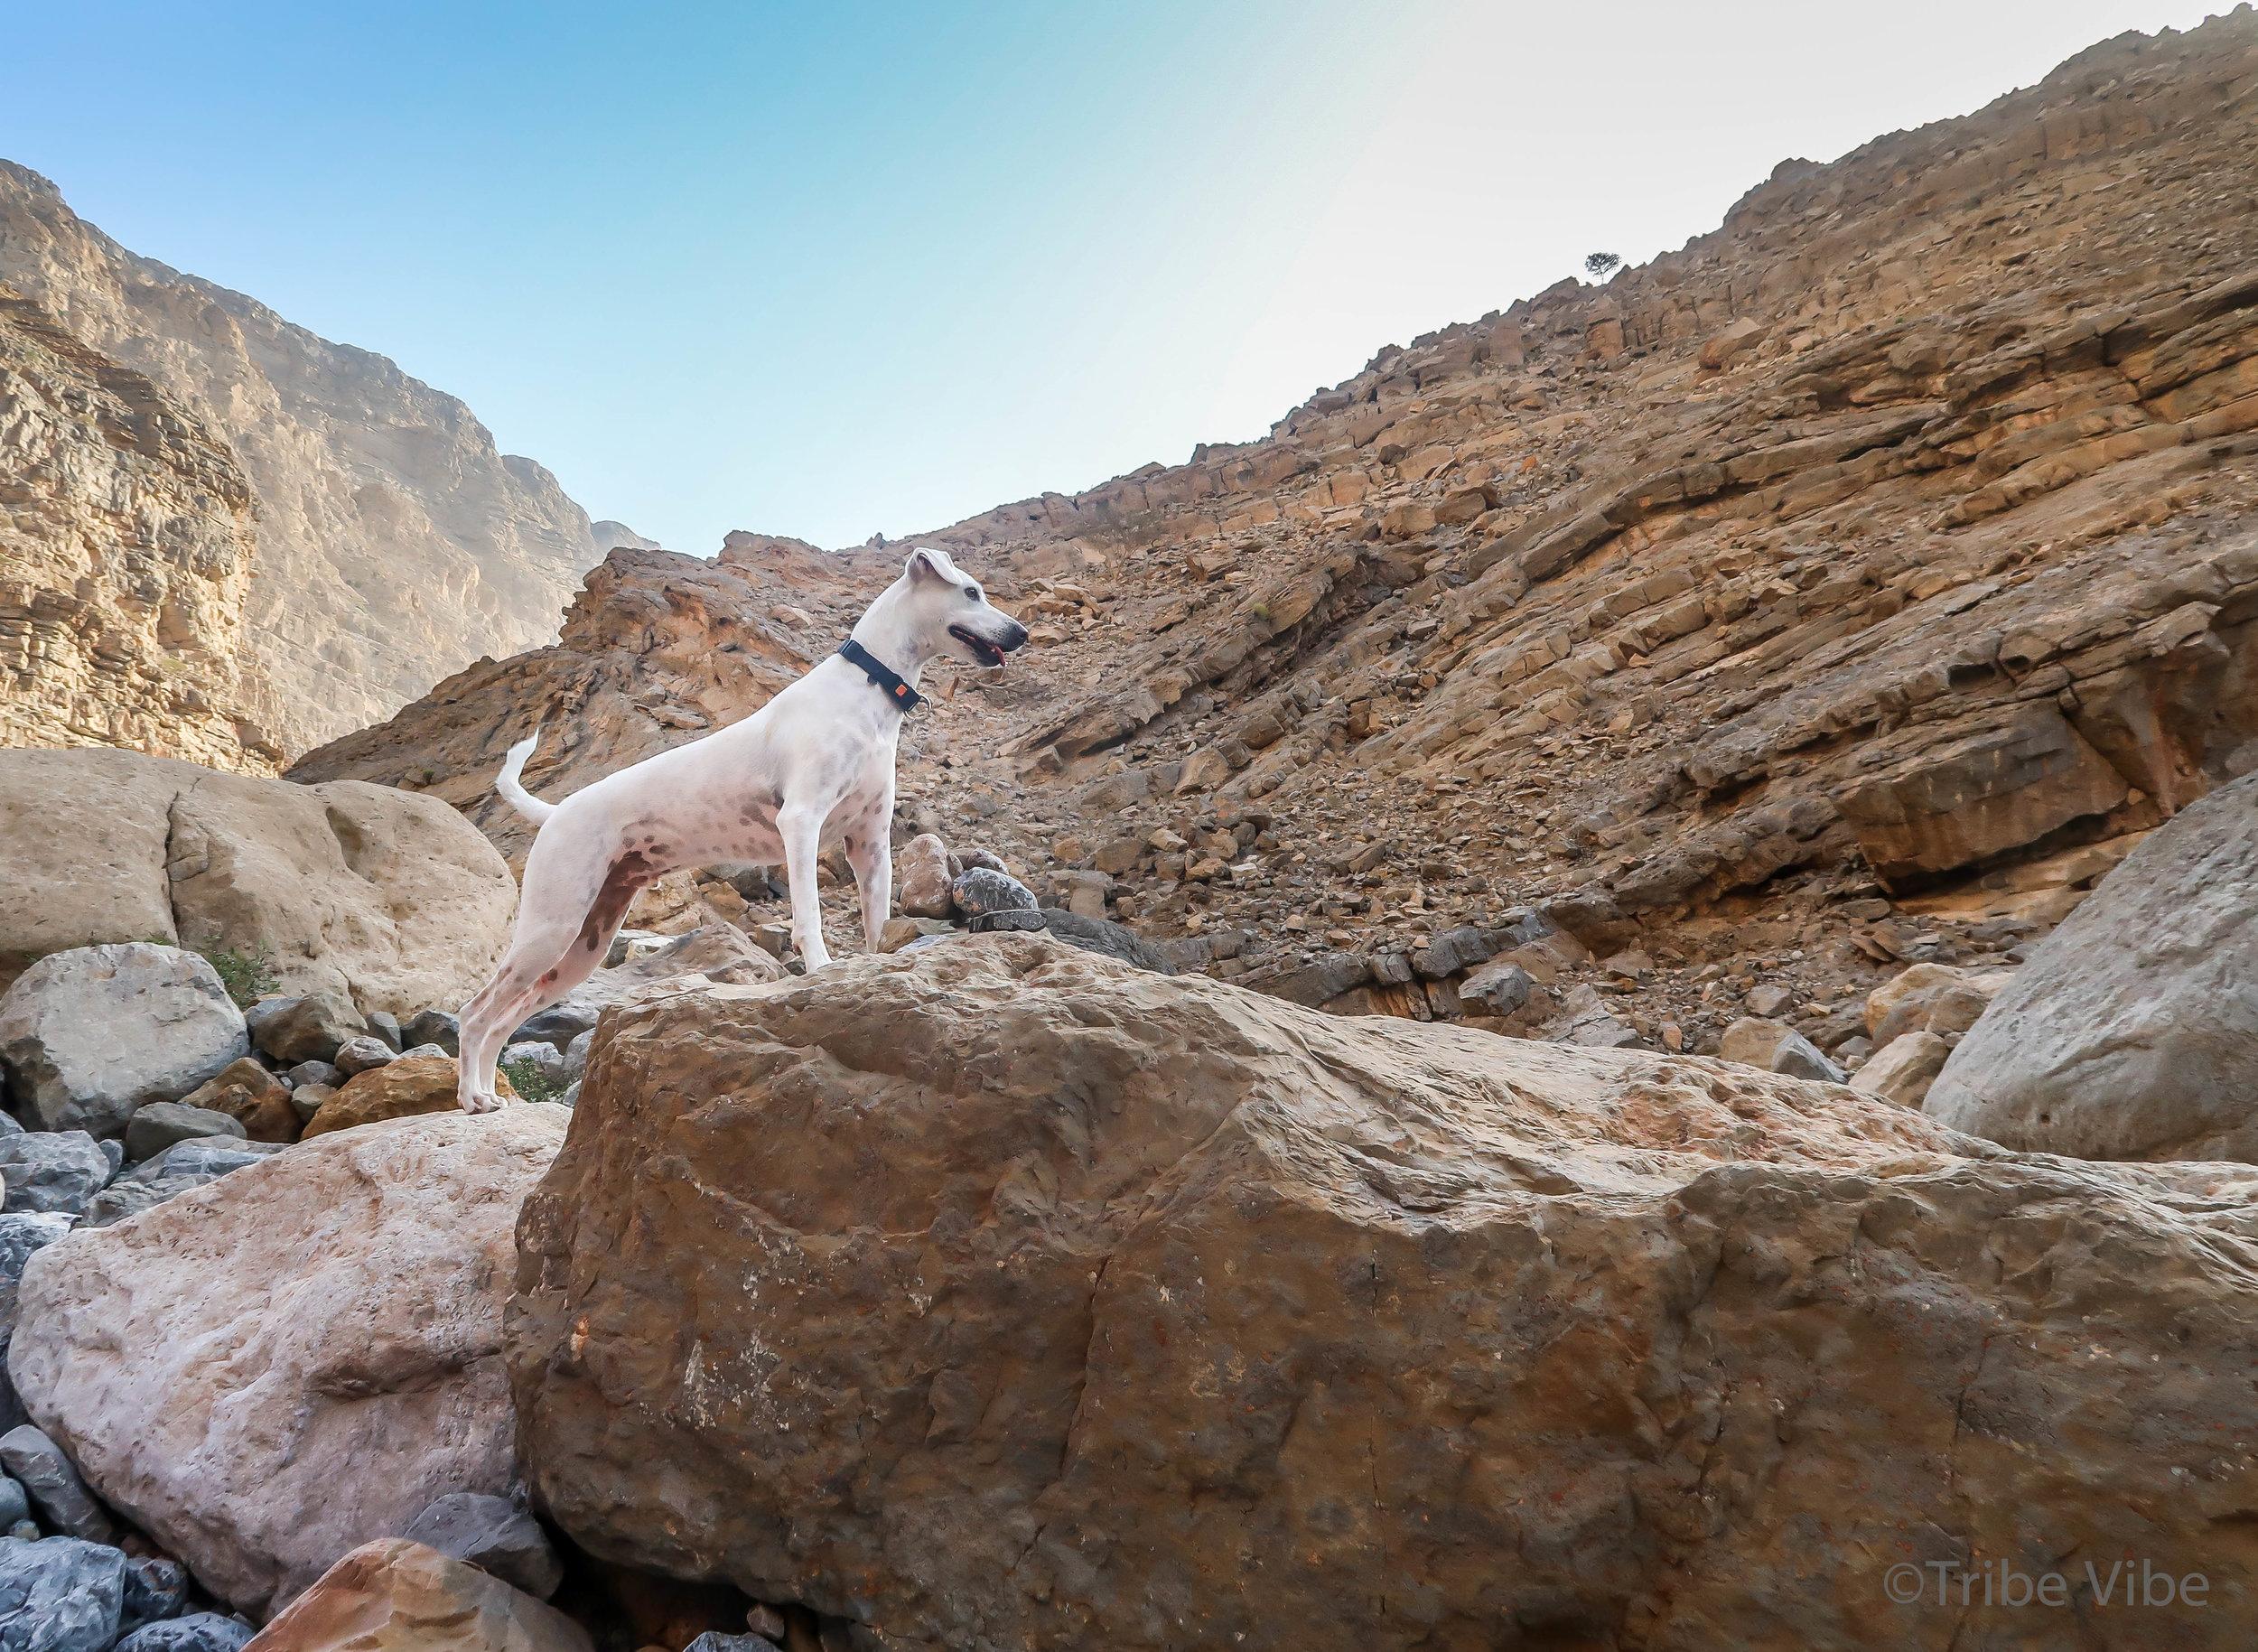 Spice enjoying his adventure in RAK